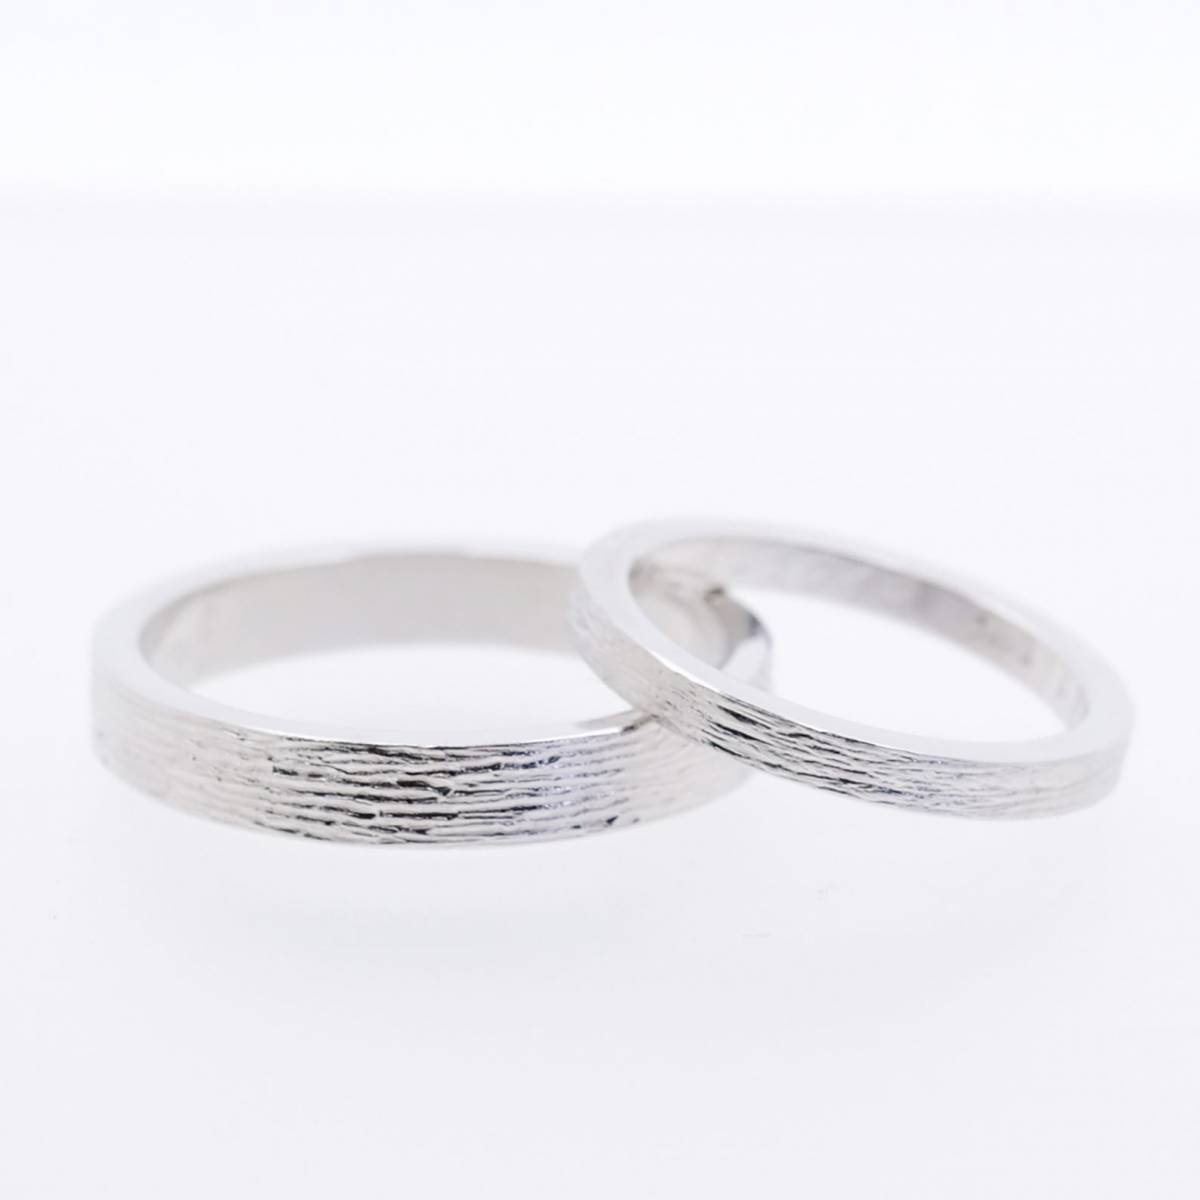 Jonas Maes Jewels - Juwelen - Bruidsjuwelen - Verlovingsring - Trouwring - House of Weddings - 5